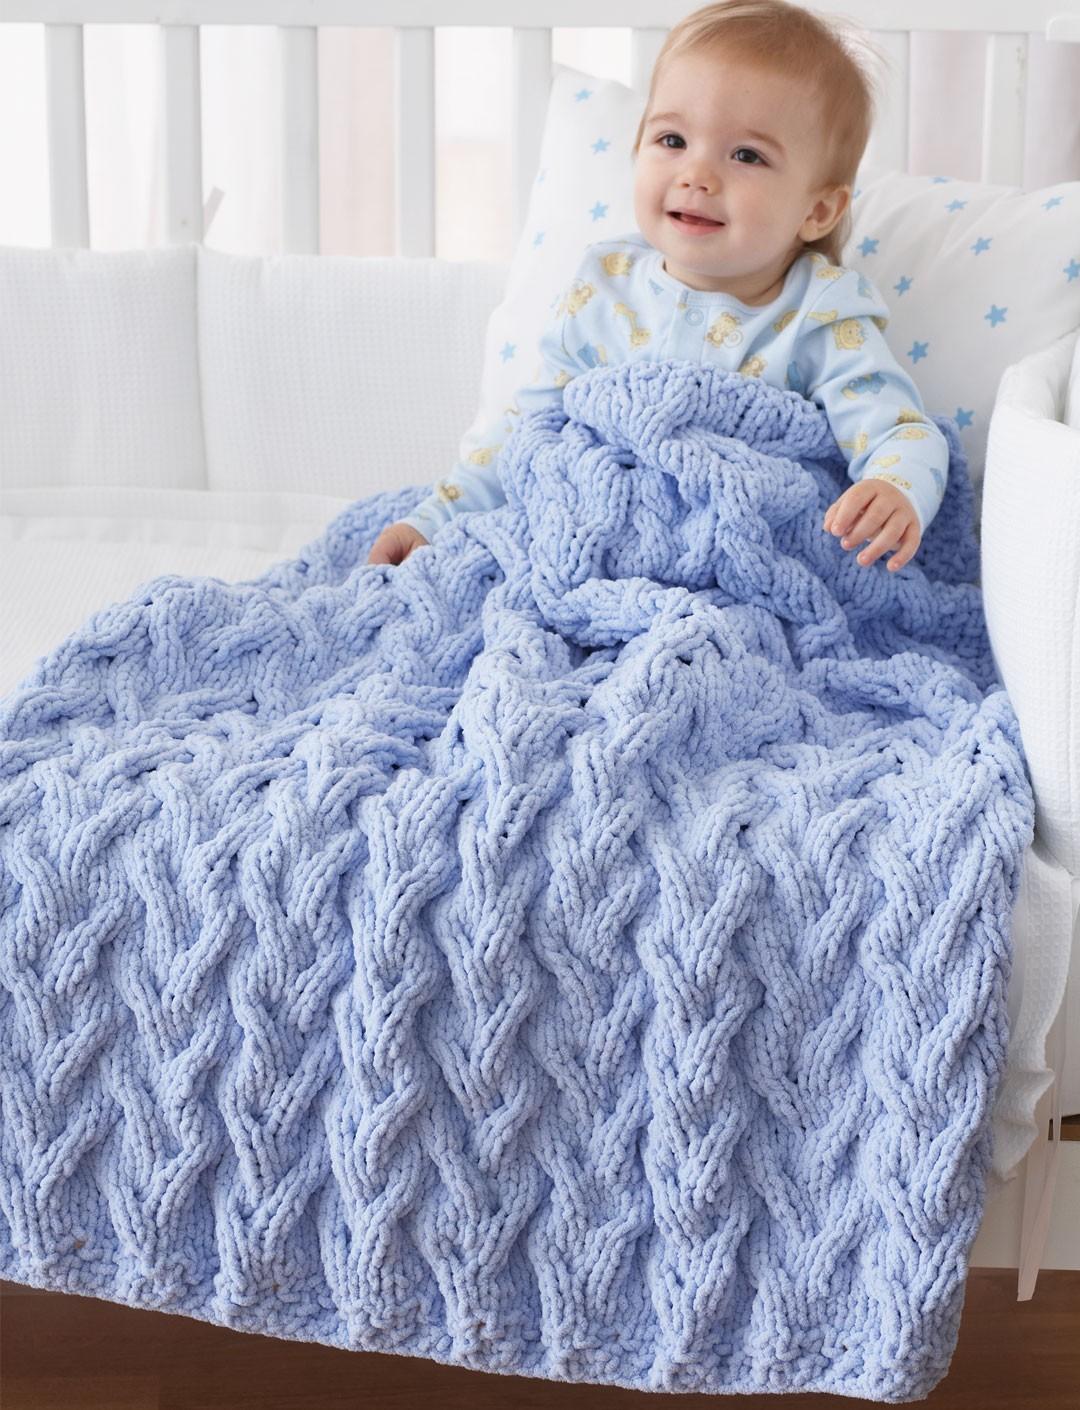 What You Should Know Before Proceeding Crochet Chunky Yarn Patterns Ba Blanket Knitting Patterns Bulky Yarn